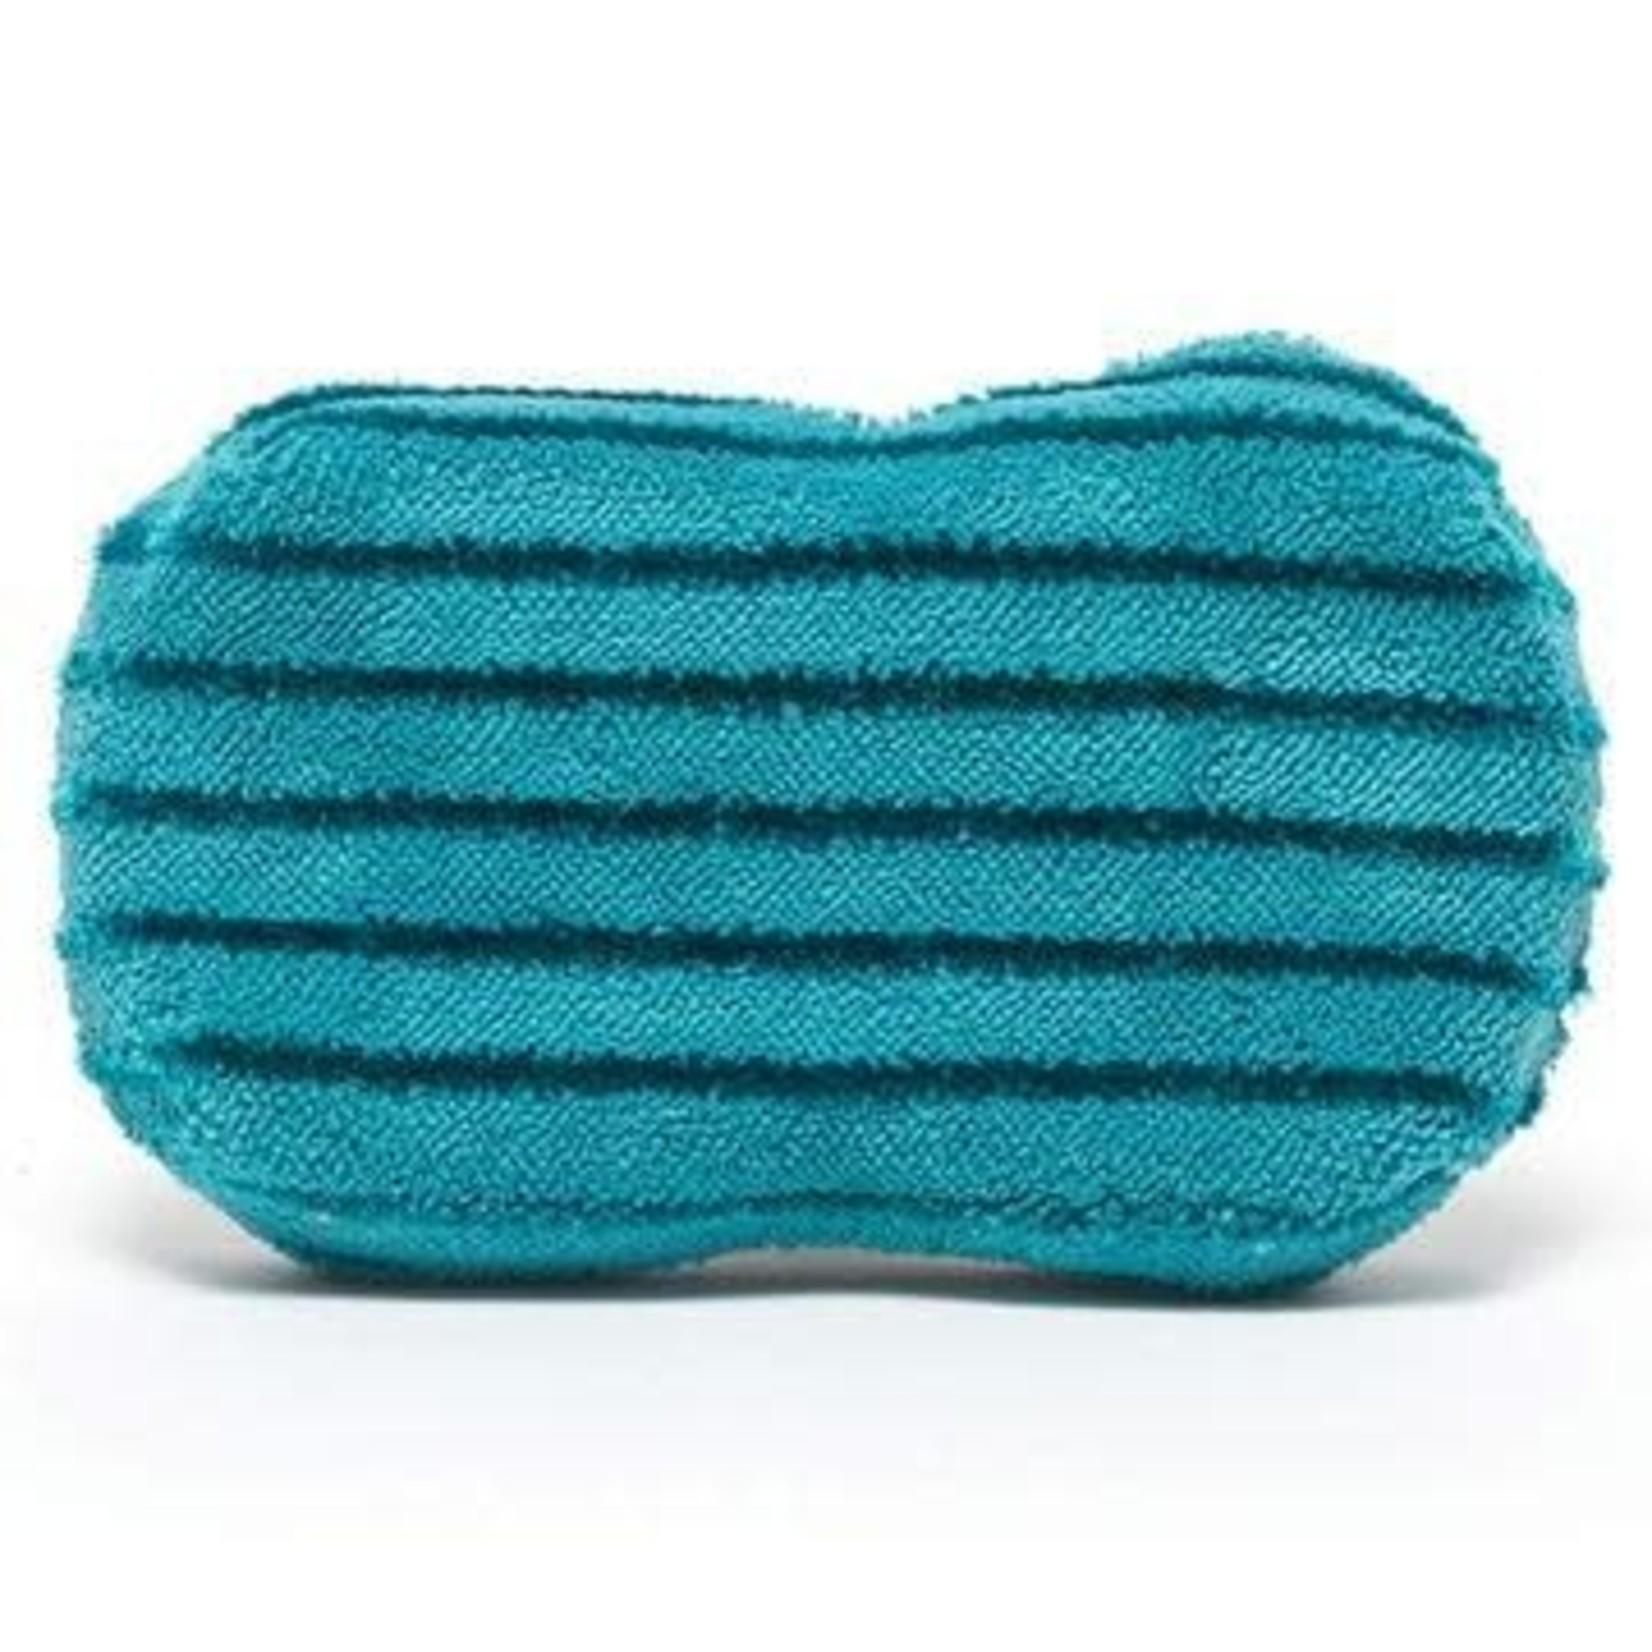 Messy Mutts Microfiber Ultimate Bowl Sponge